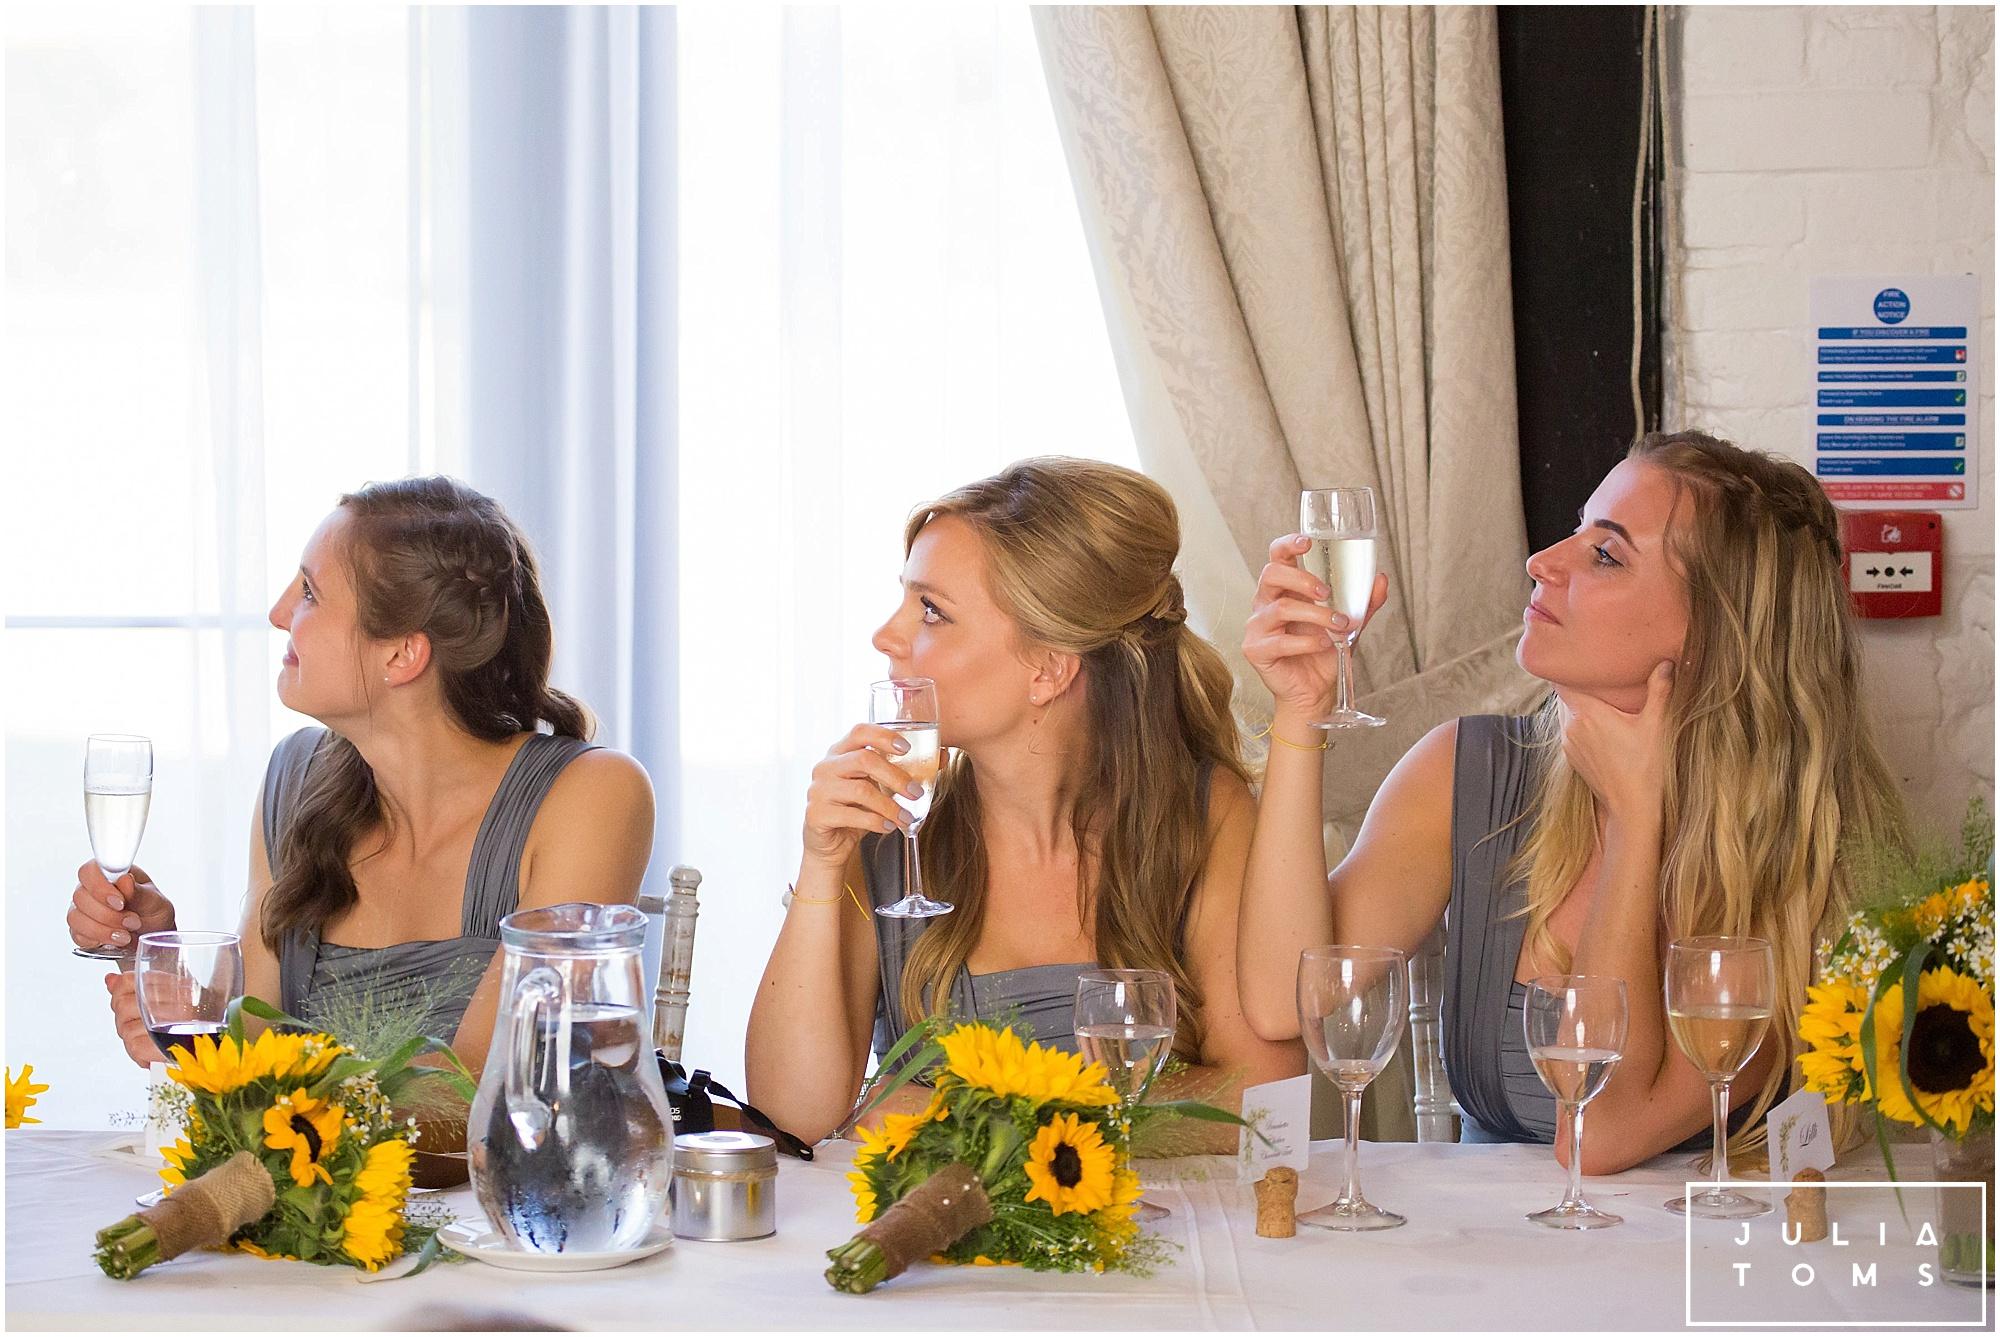 julia_toms_chichester_wedding_photographer_worthing_074.jpg